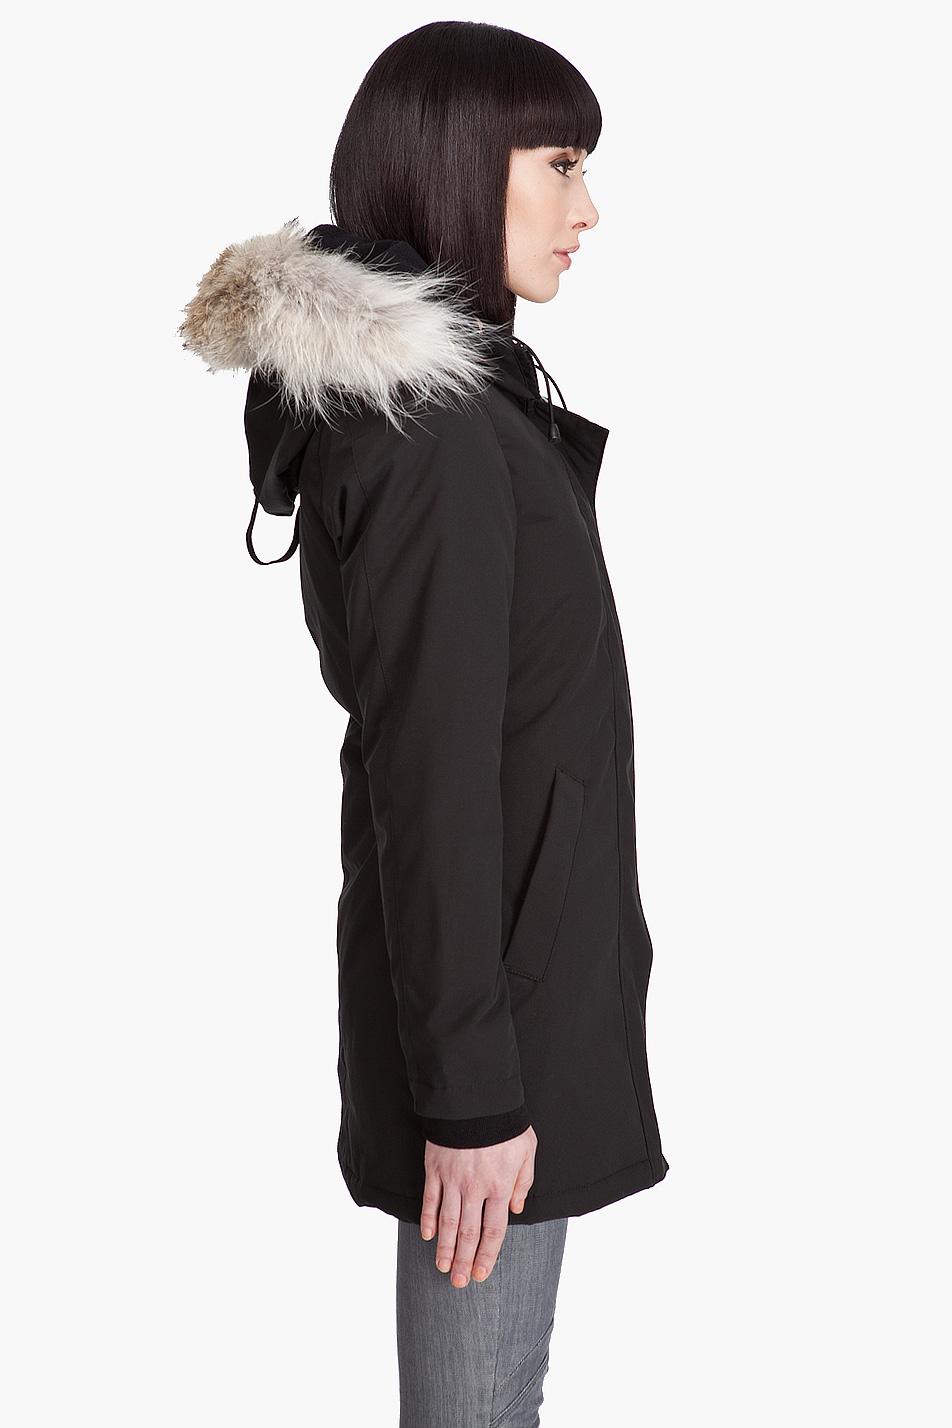 Canada Goose chilliwack parka online store - canada-goose-black-victoria-parka-product-3-196808-049927635.jpeg